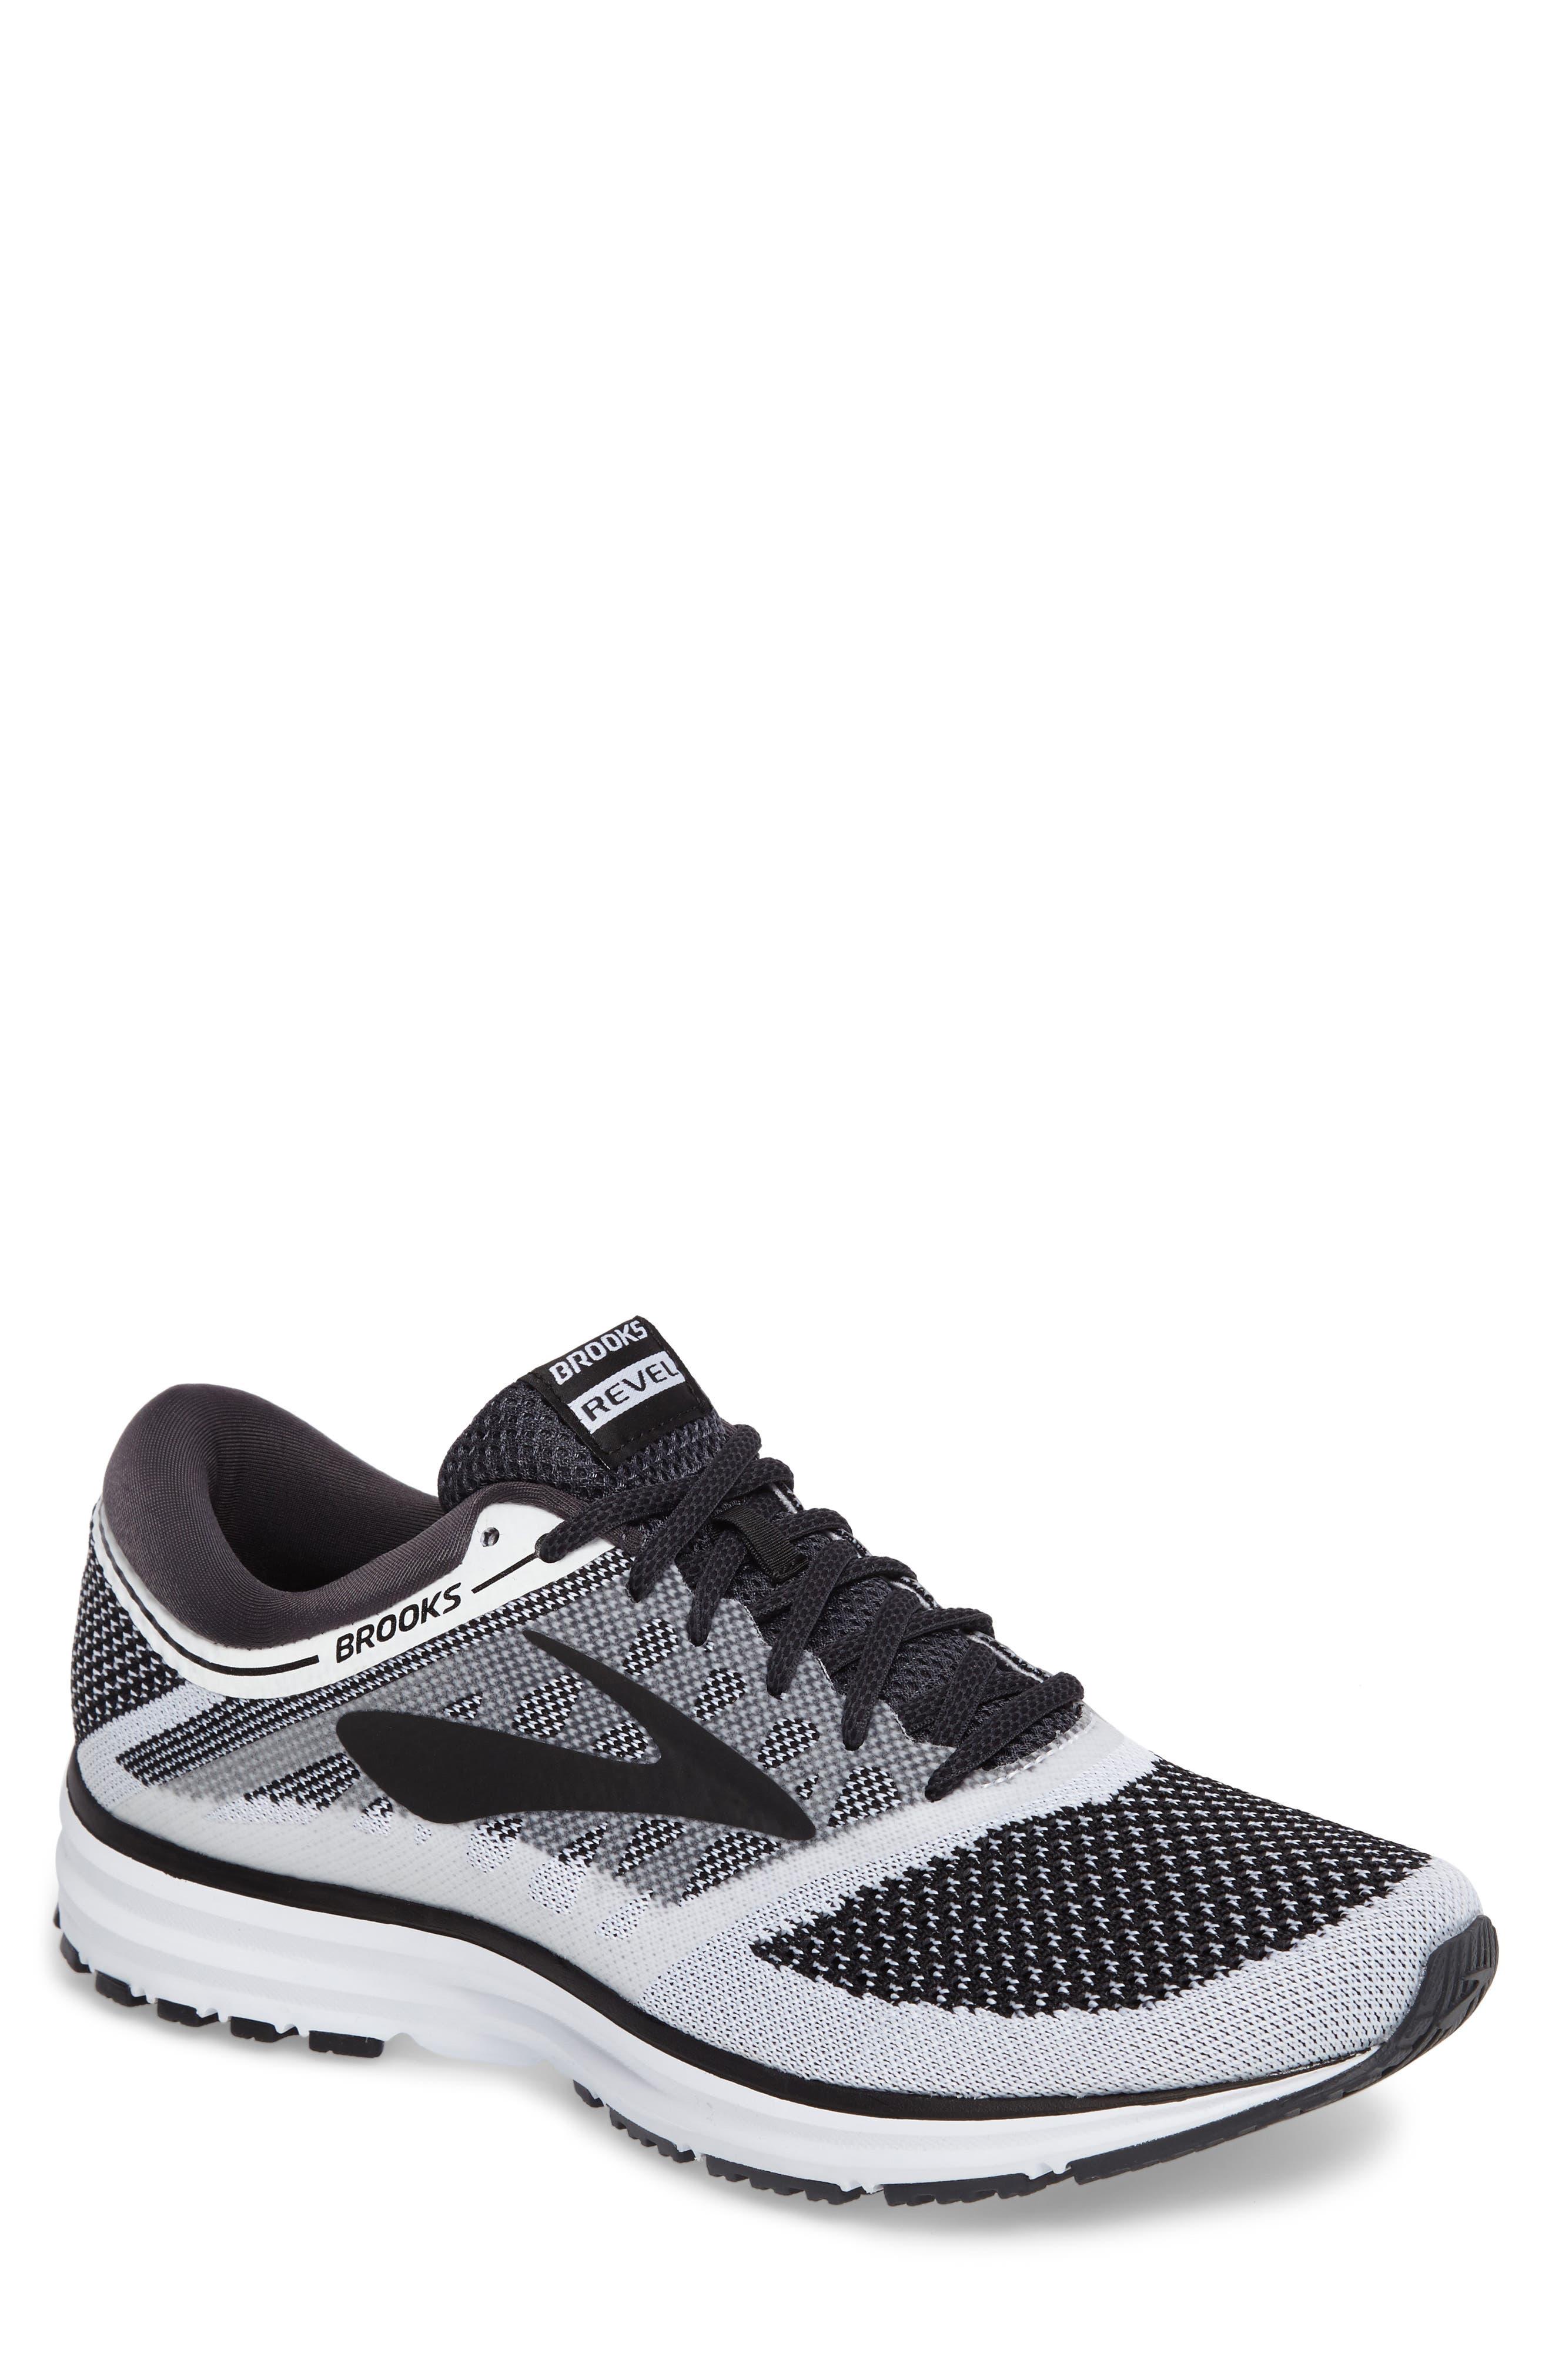 Revel Sneaker,                         Main,                         color, White/ Anthracite/ Black